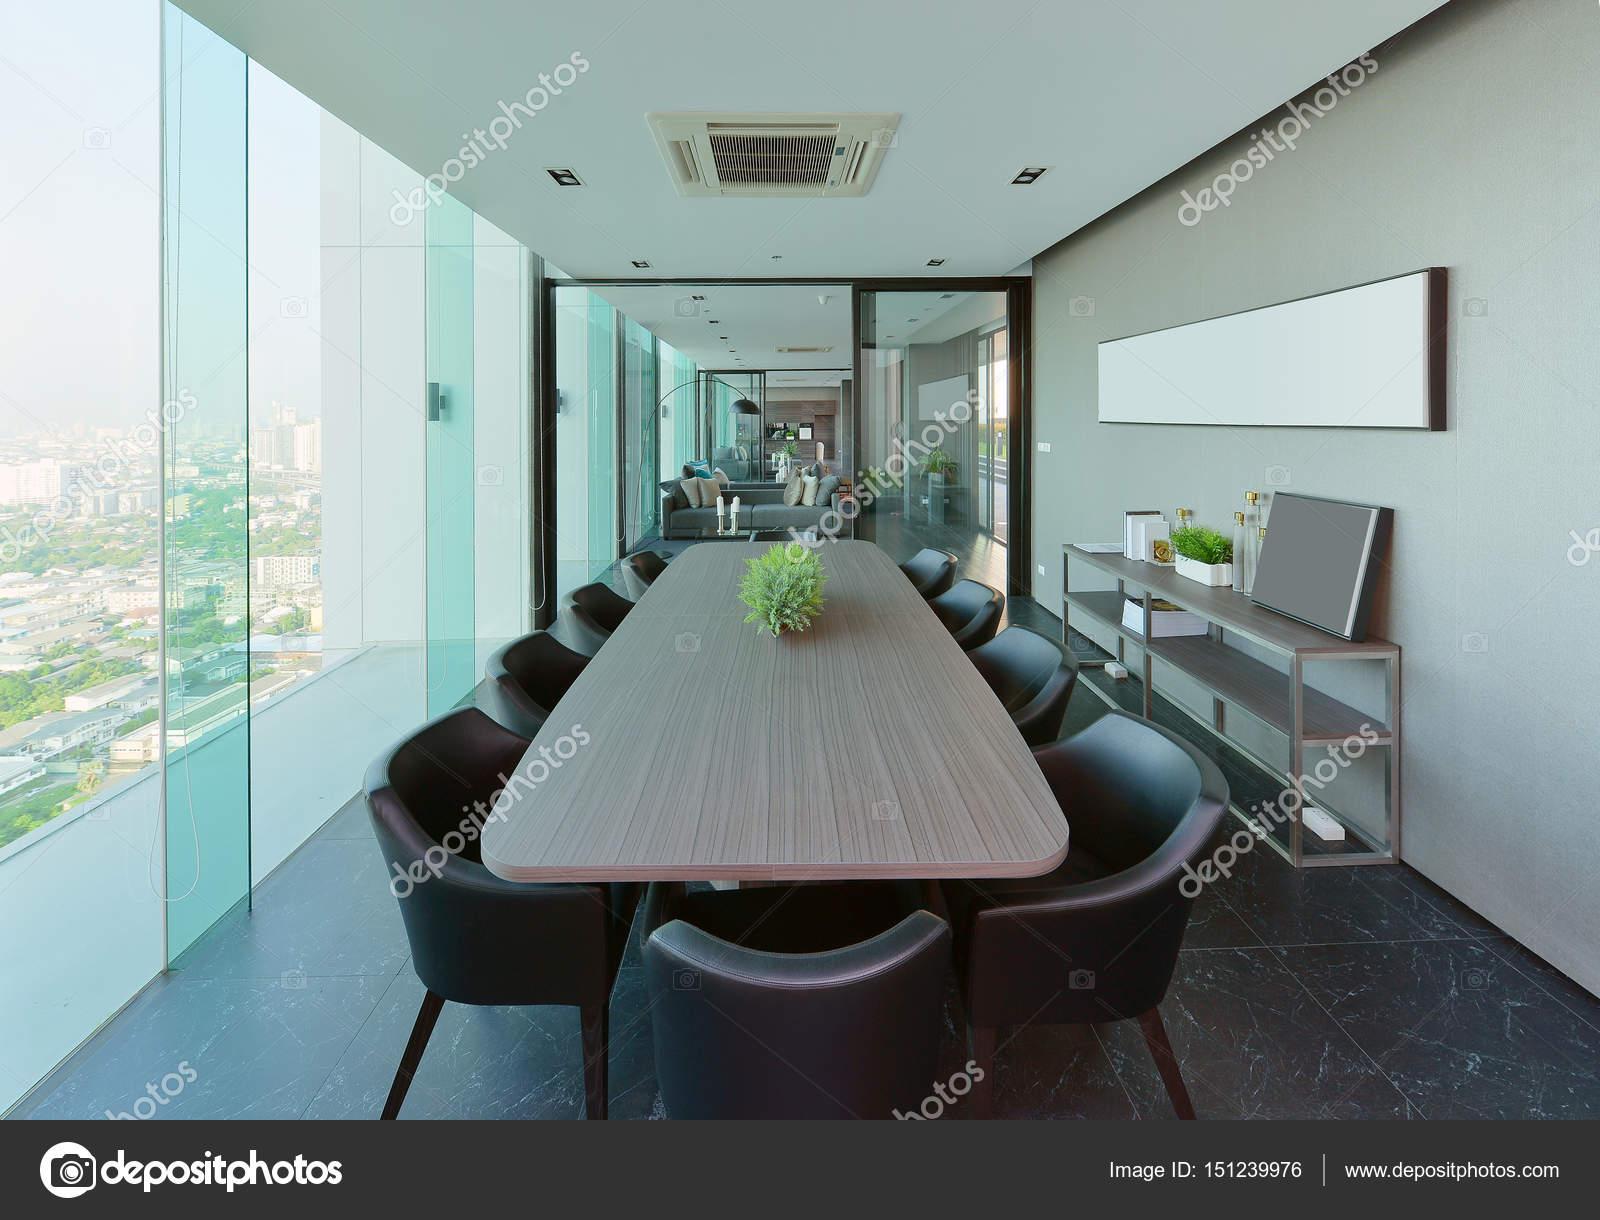 luxe moderne vergaderzalen kamer interieur en decoratie interieur des stockfoto